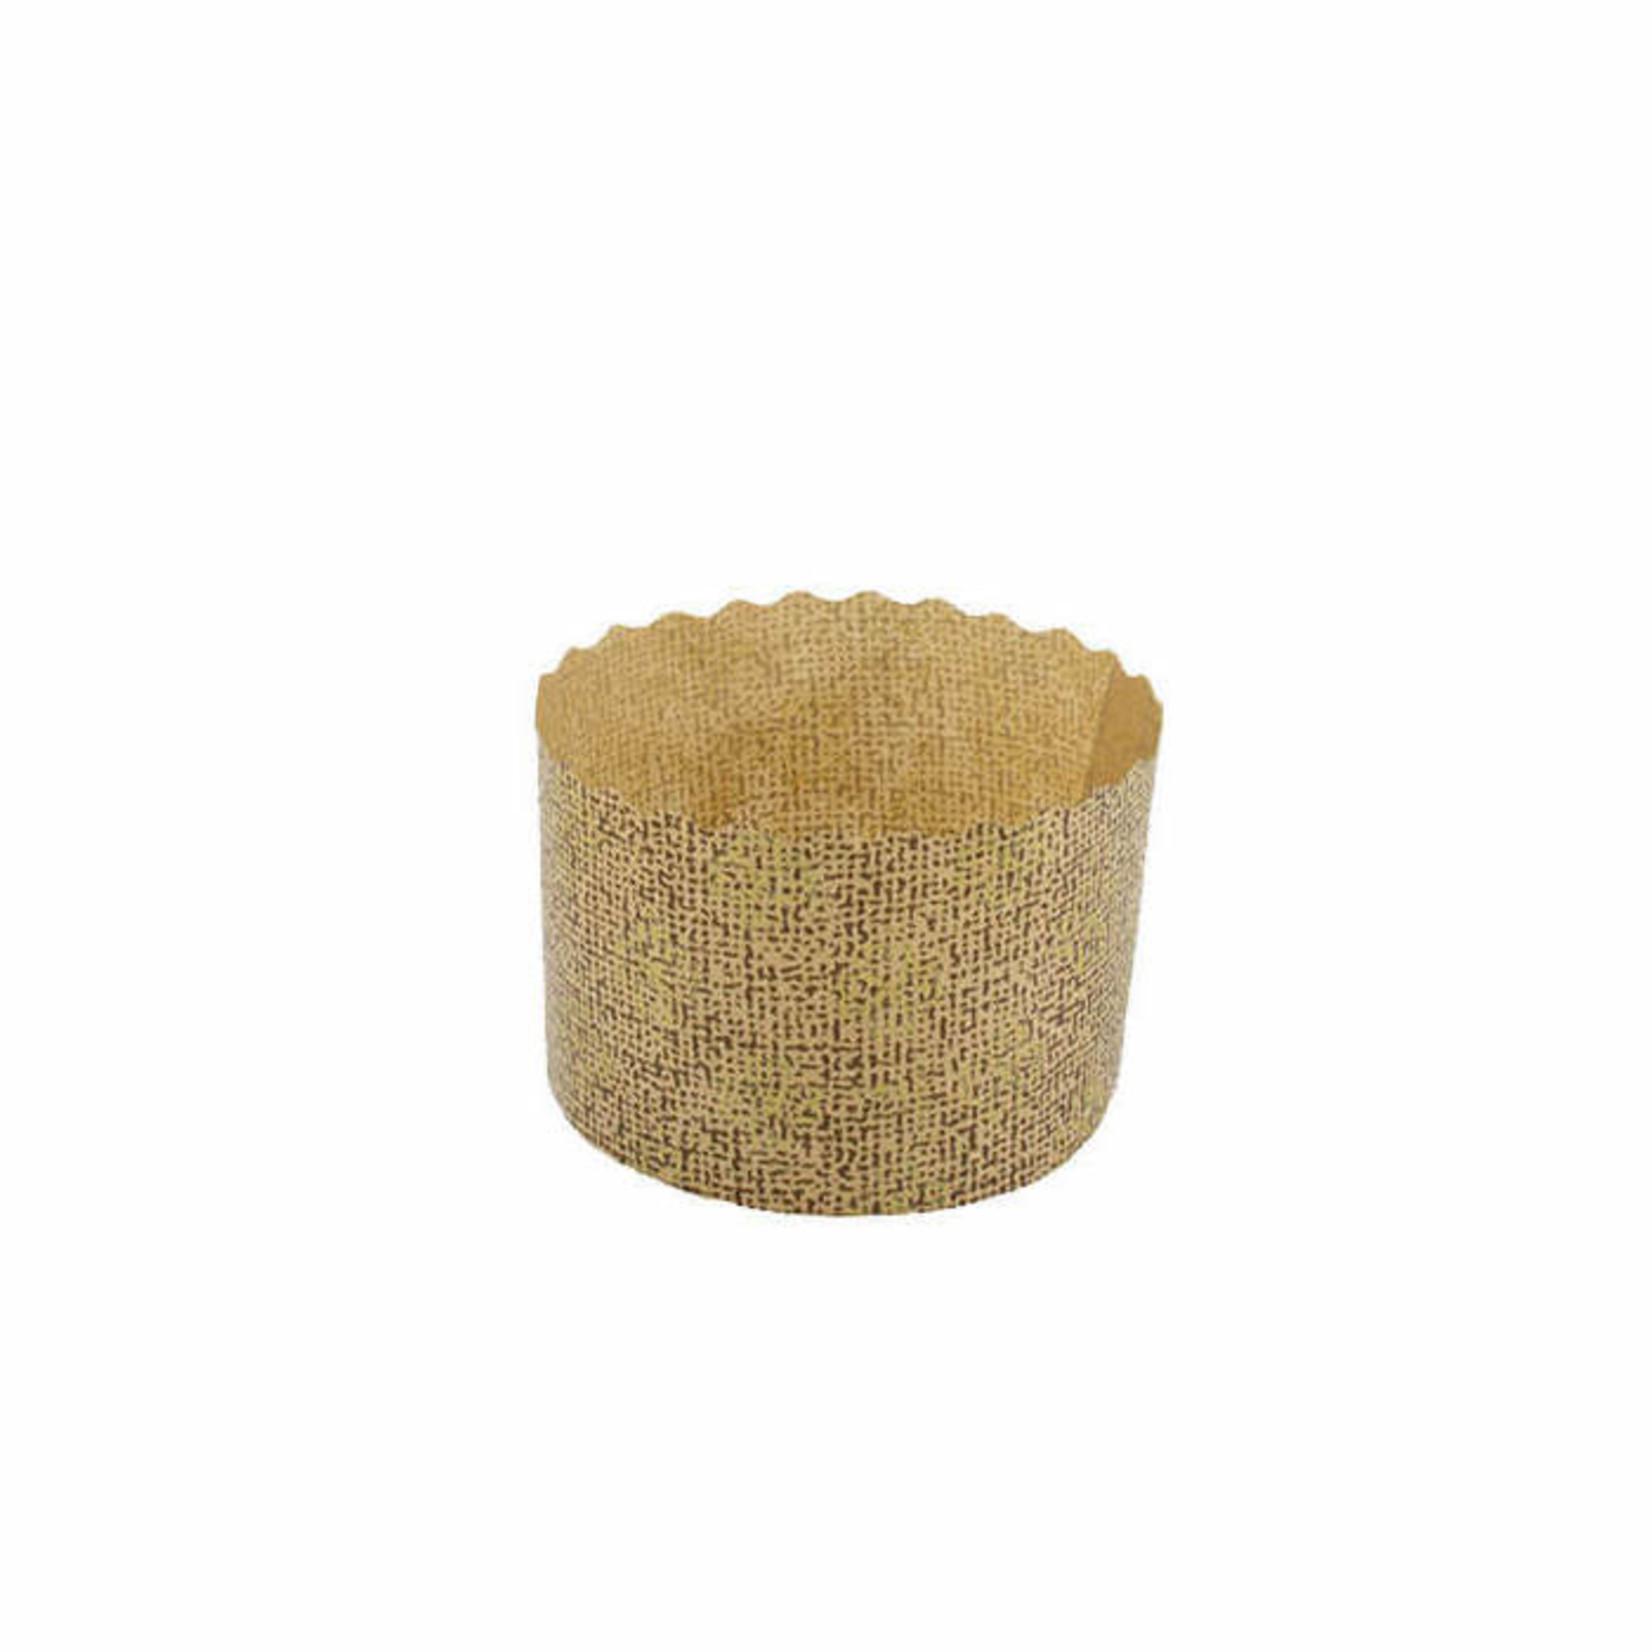 "Novacart Novacart - Panettone Baking Mold - 2-3/4"" x 2"" (125ct), P70/50, G9F13004-S"